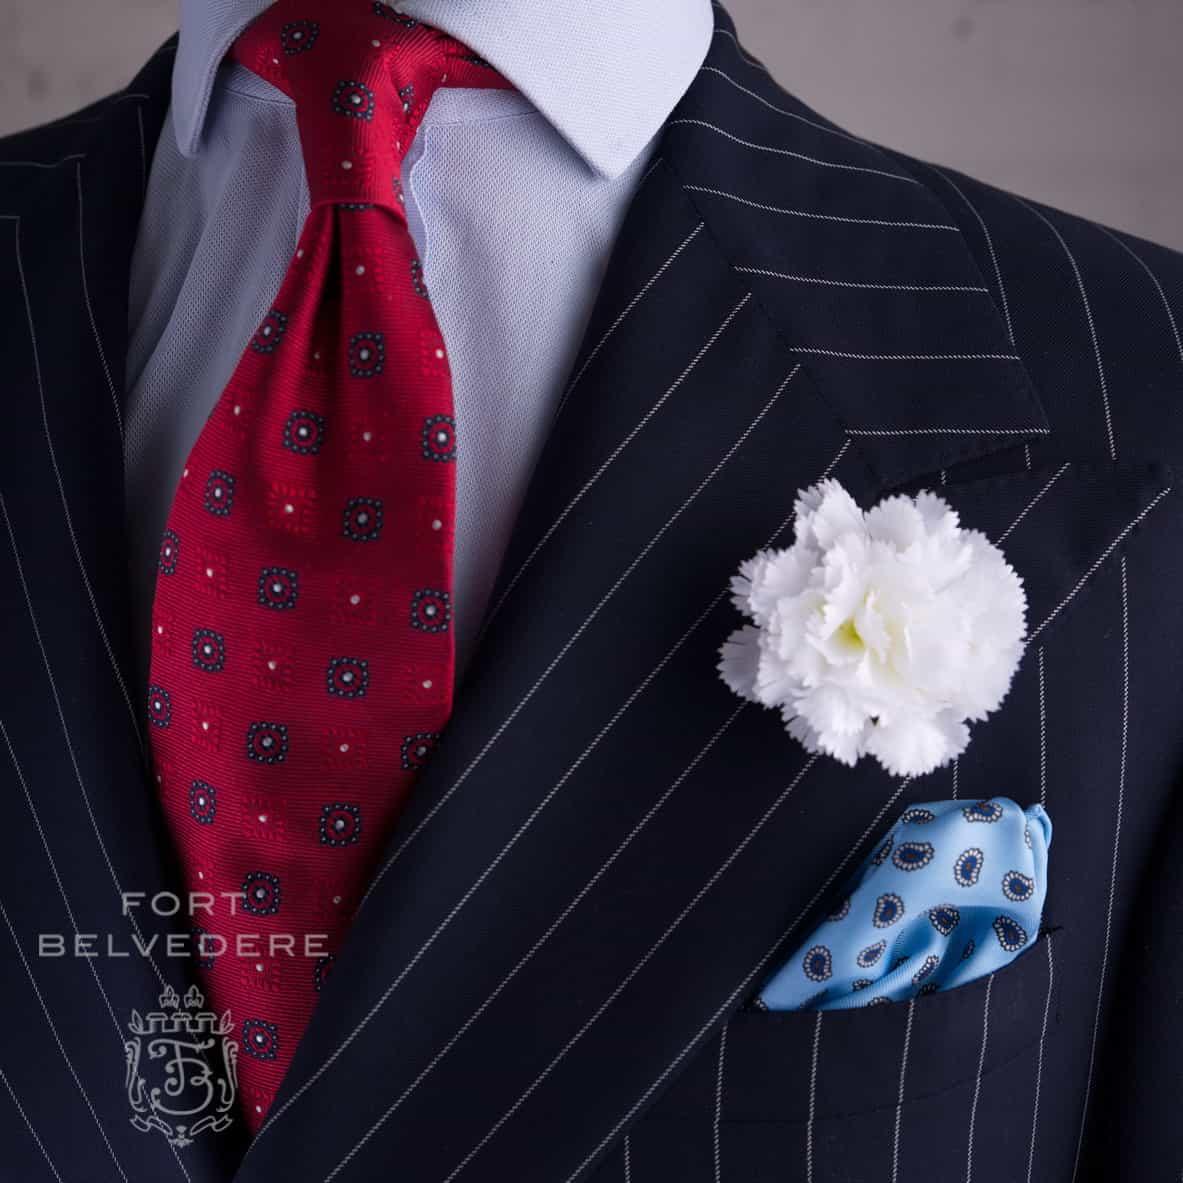 7 Quality Hallmarks Of A Tie Gentlemans Gazette Dasi Bowtie Knit Slim Wedding Best Man Self Bow Purple Flower Chalk Stripe Suit With White Large Carnation Light Blue Silk Pocket Square And Red Jacquard